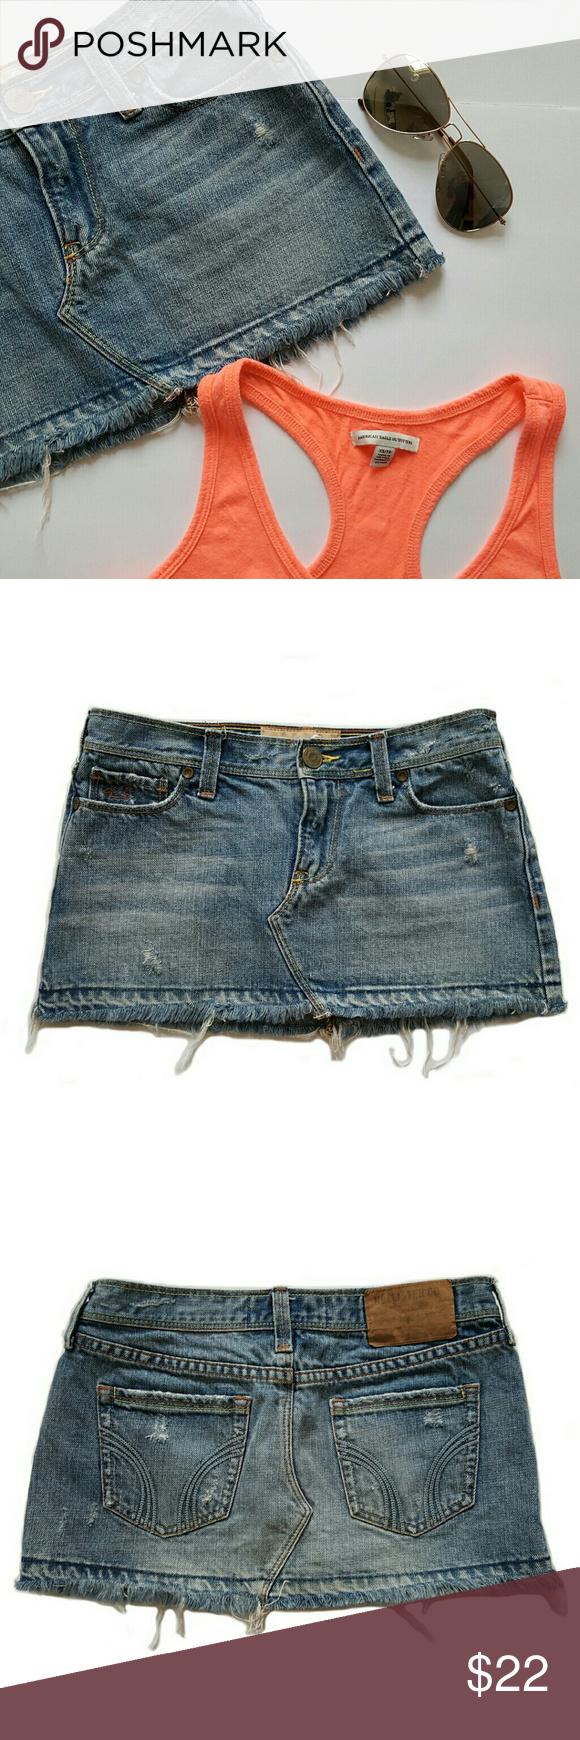 "Hollister Denim Skirt Hollister Denim Skirt Size: 0 100% Cotton Length- 10"" Hollister Skirts Mini"